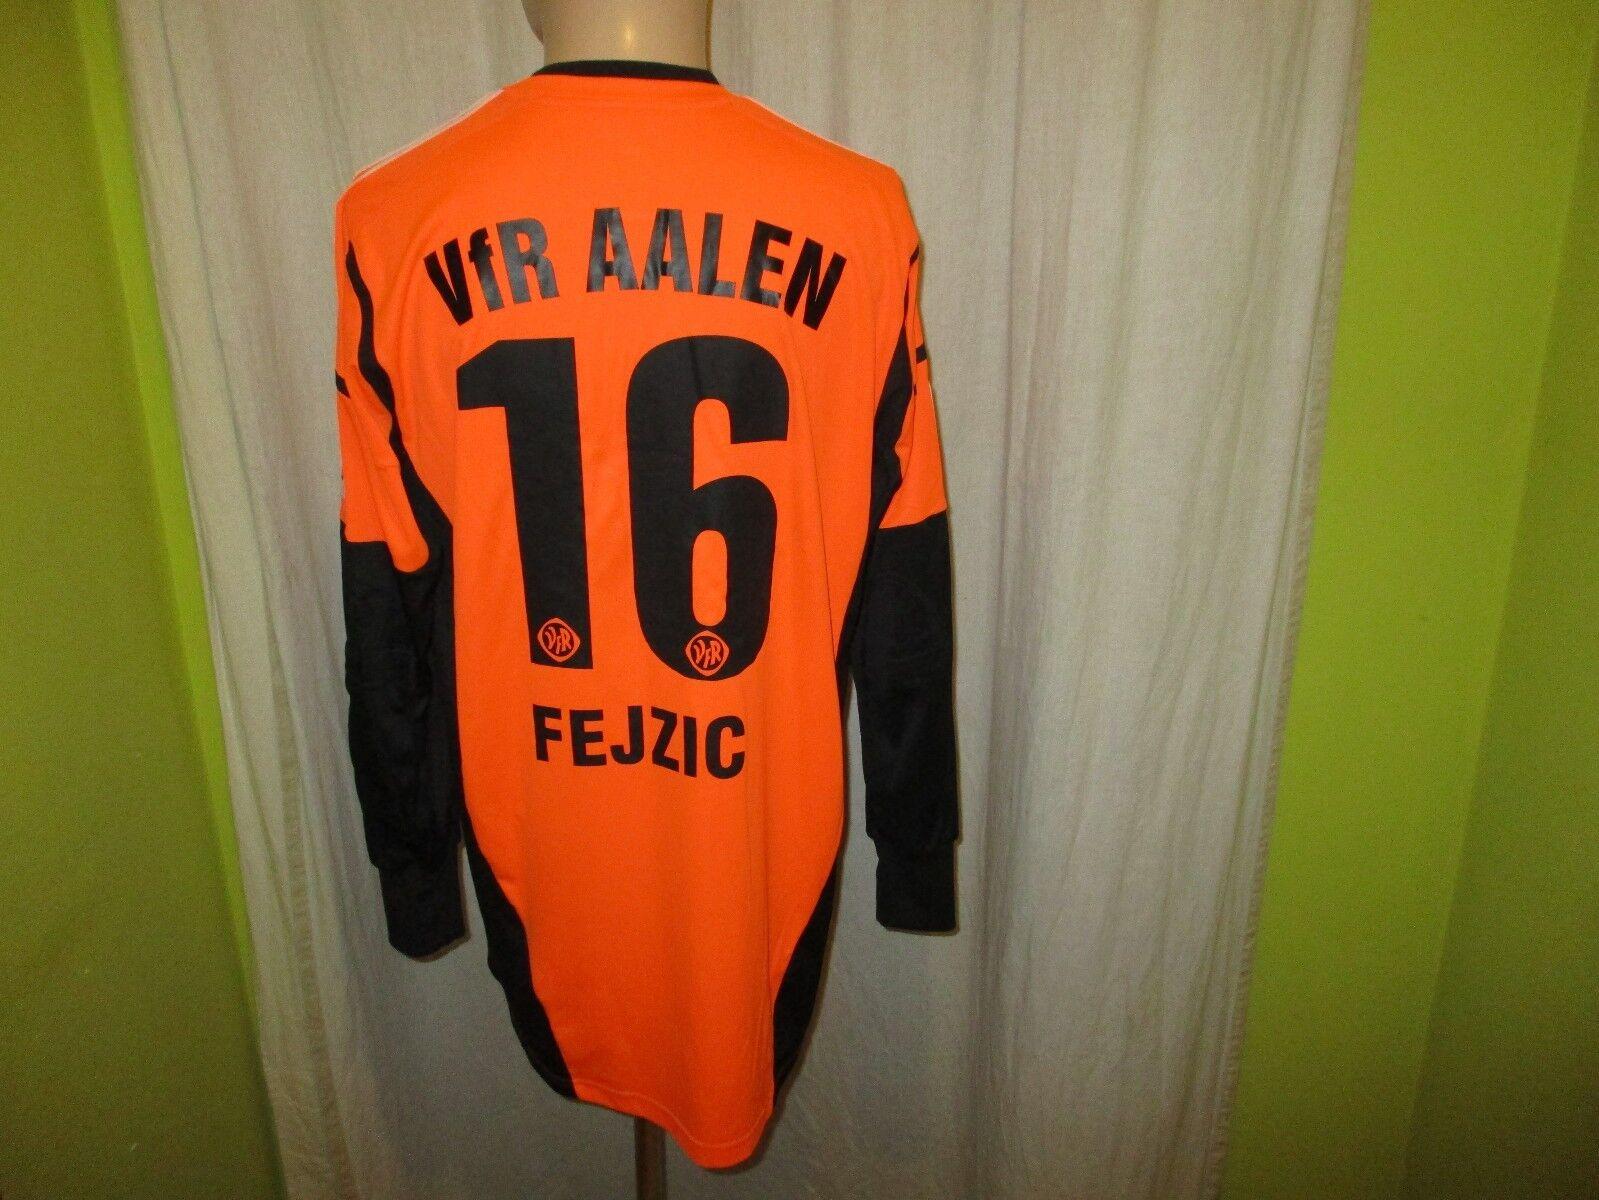 VfR Aalen Adidas Torwart Matchworn Trikot 2012 13  imtech  + Nr.16 Fejzic Gr.XL  | Lebendige Form